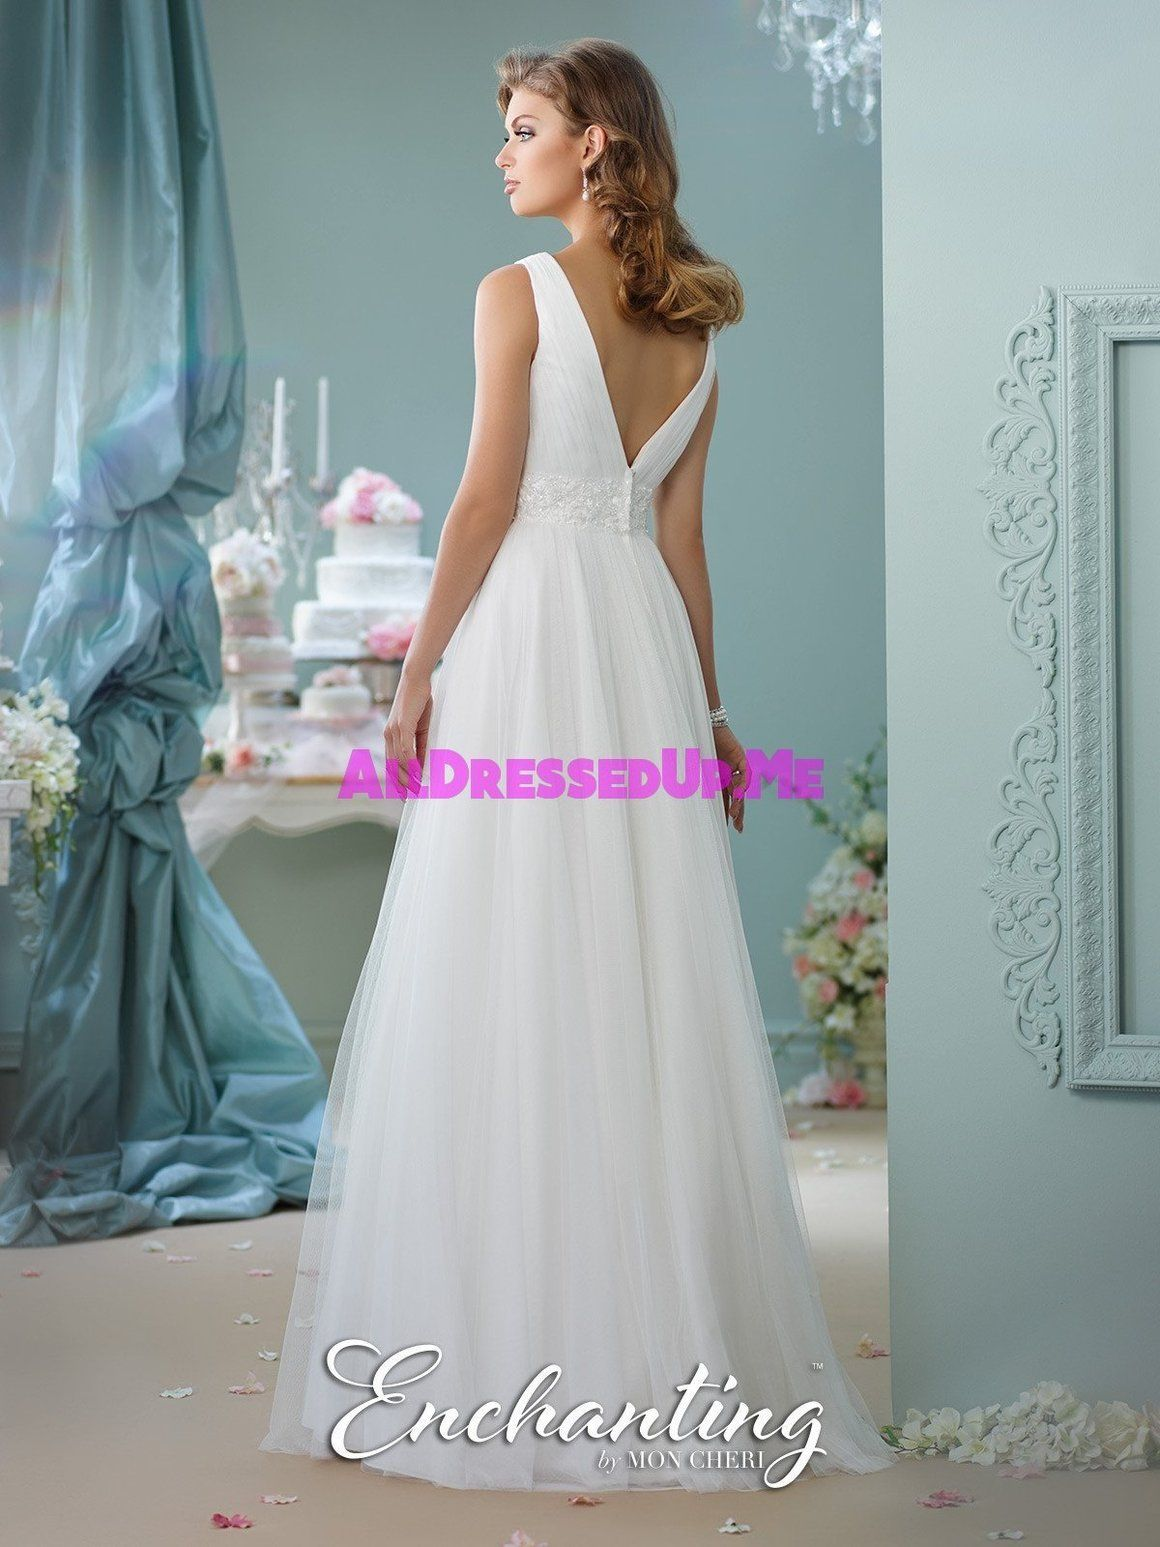 Attractive Bridal Gowns Parramatta Embellishment - Top Wedding Gowns ...